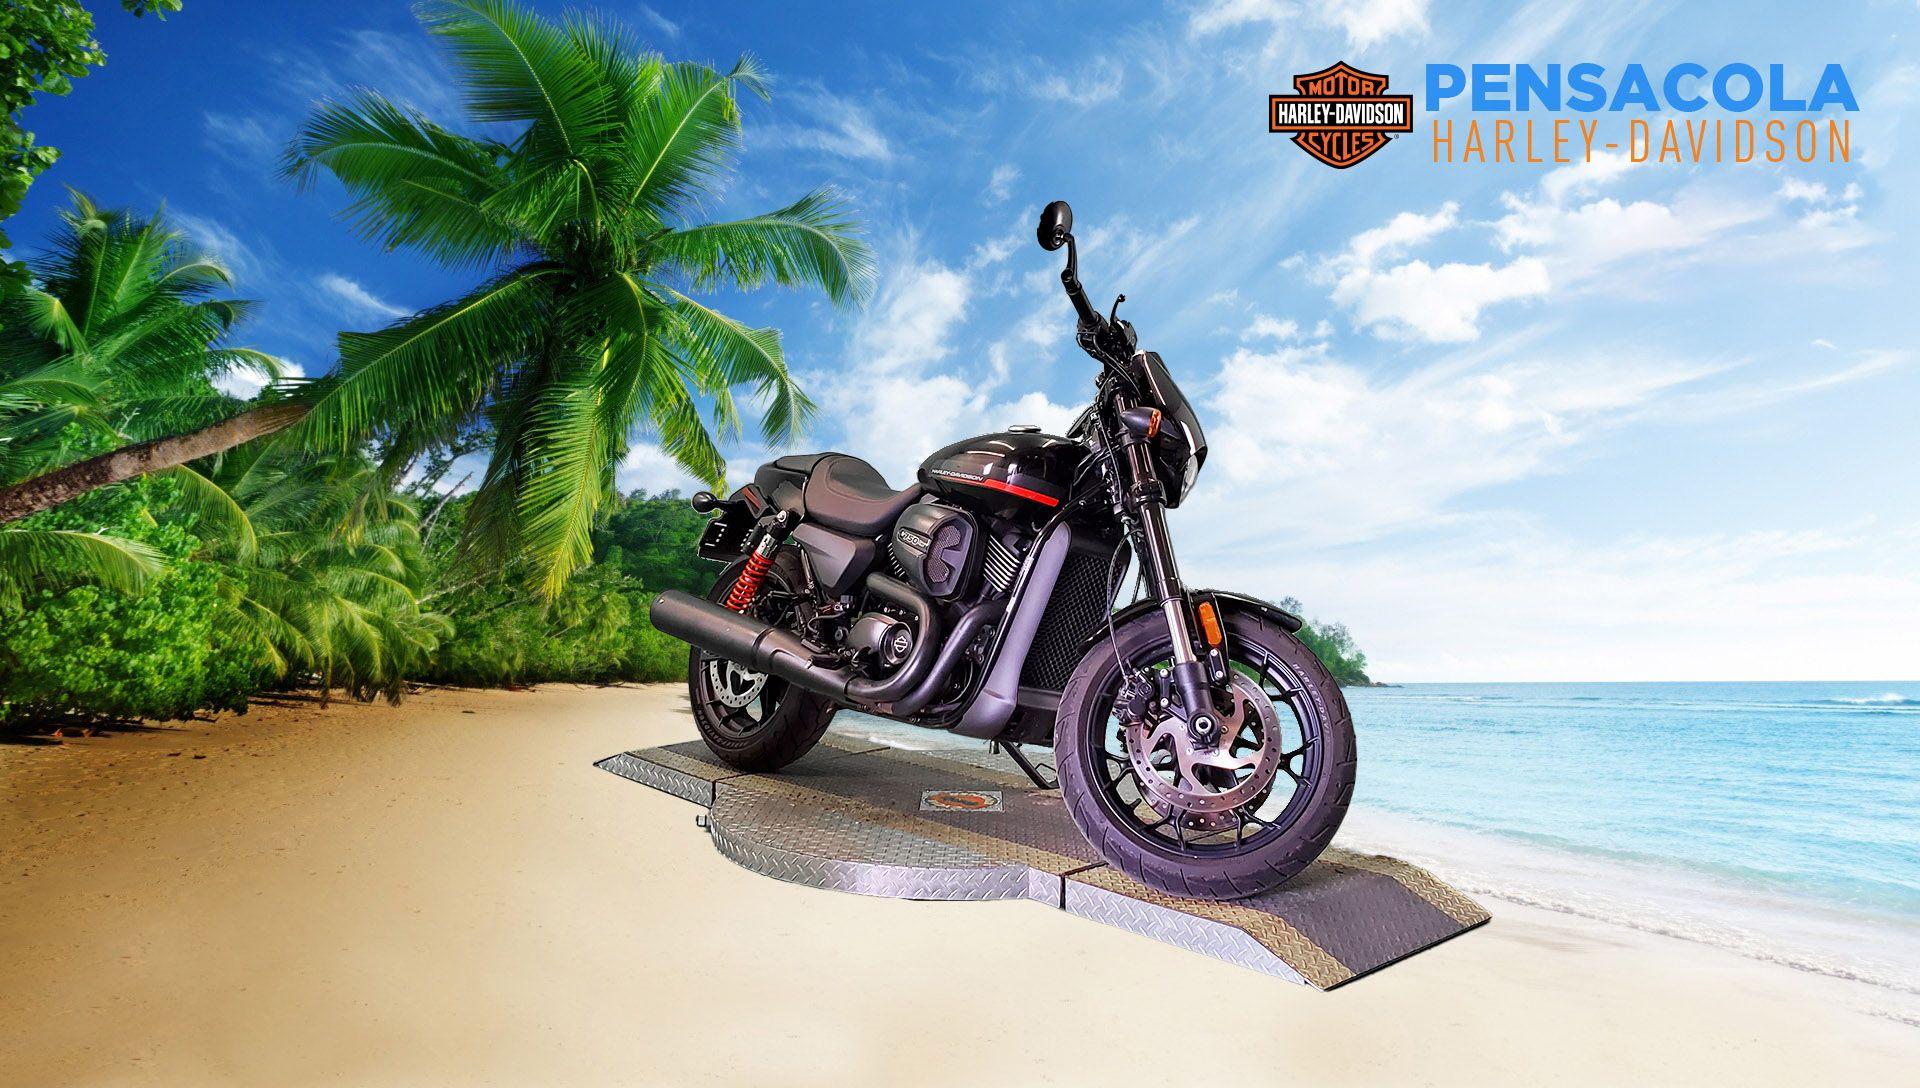 Pre-Owned 2020 Harley-Davidson Street Rod XG750A